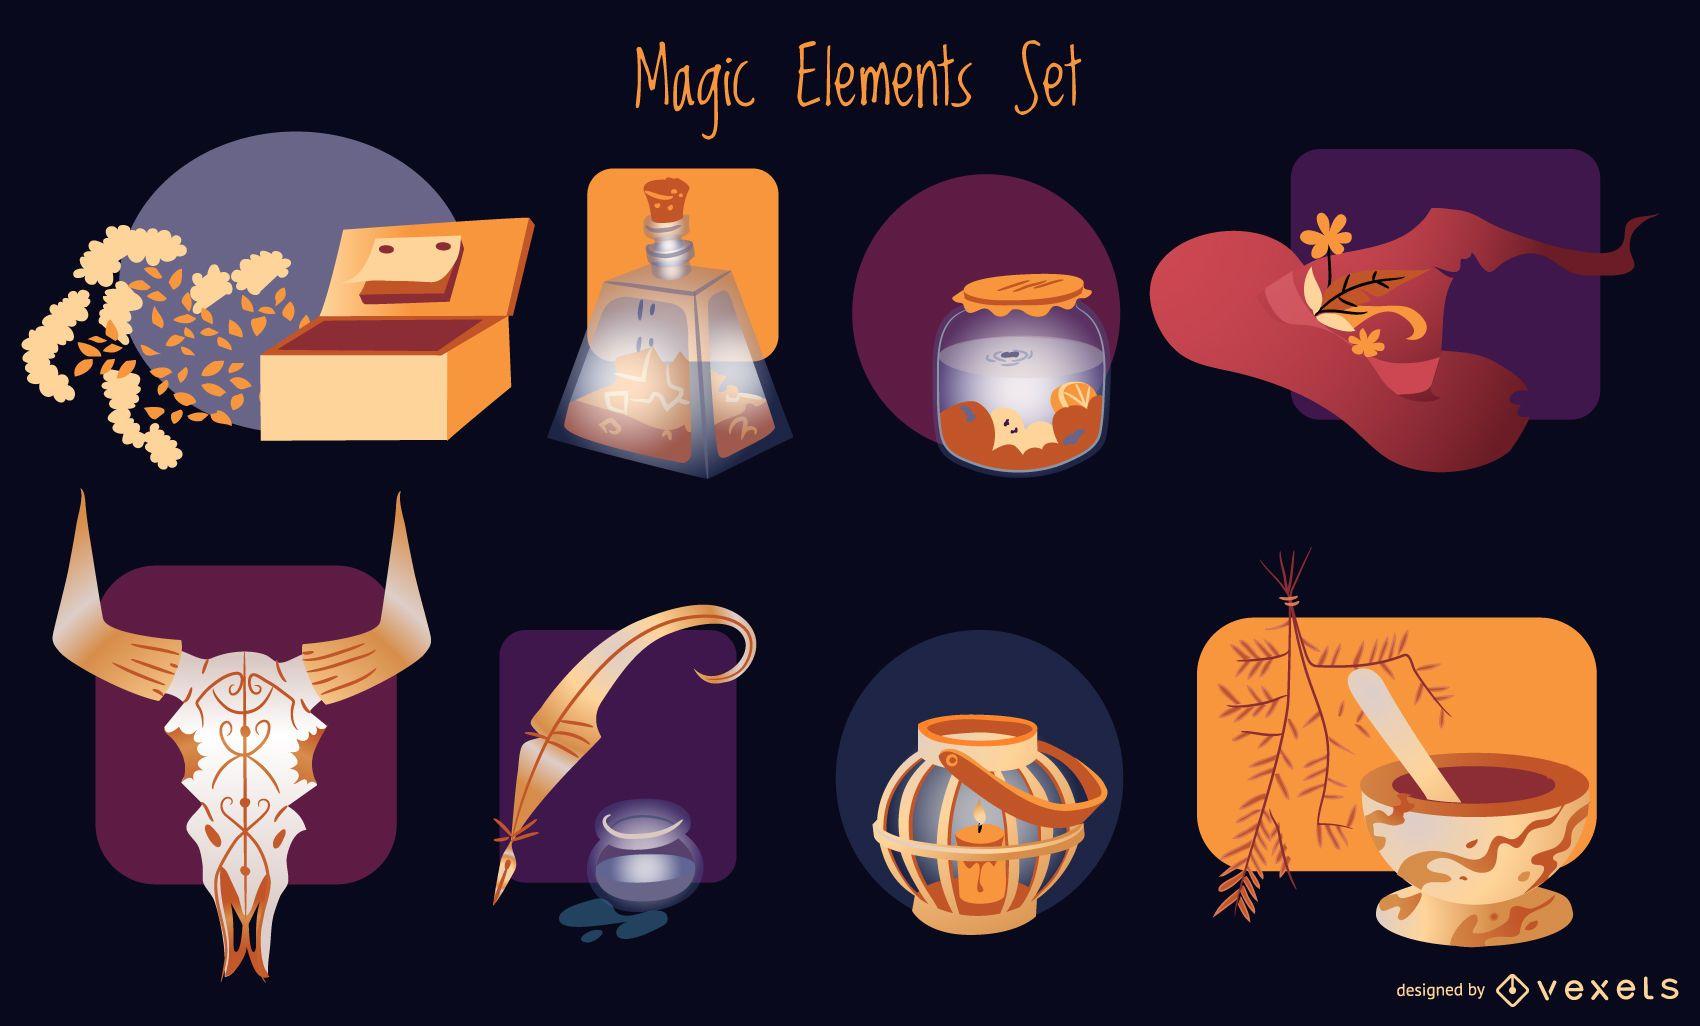 Magic elements illustration pack